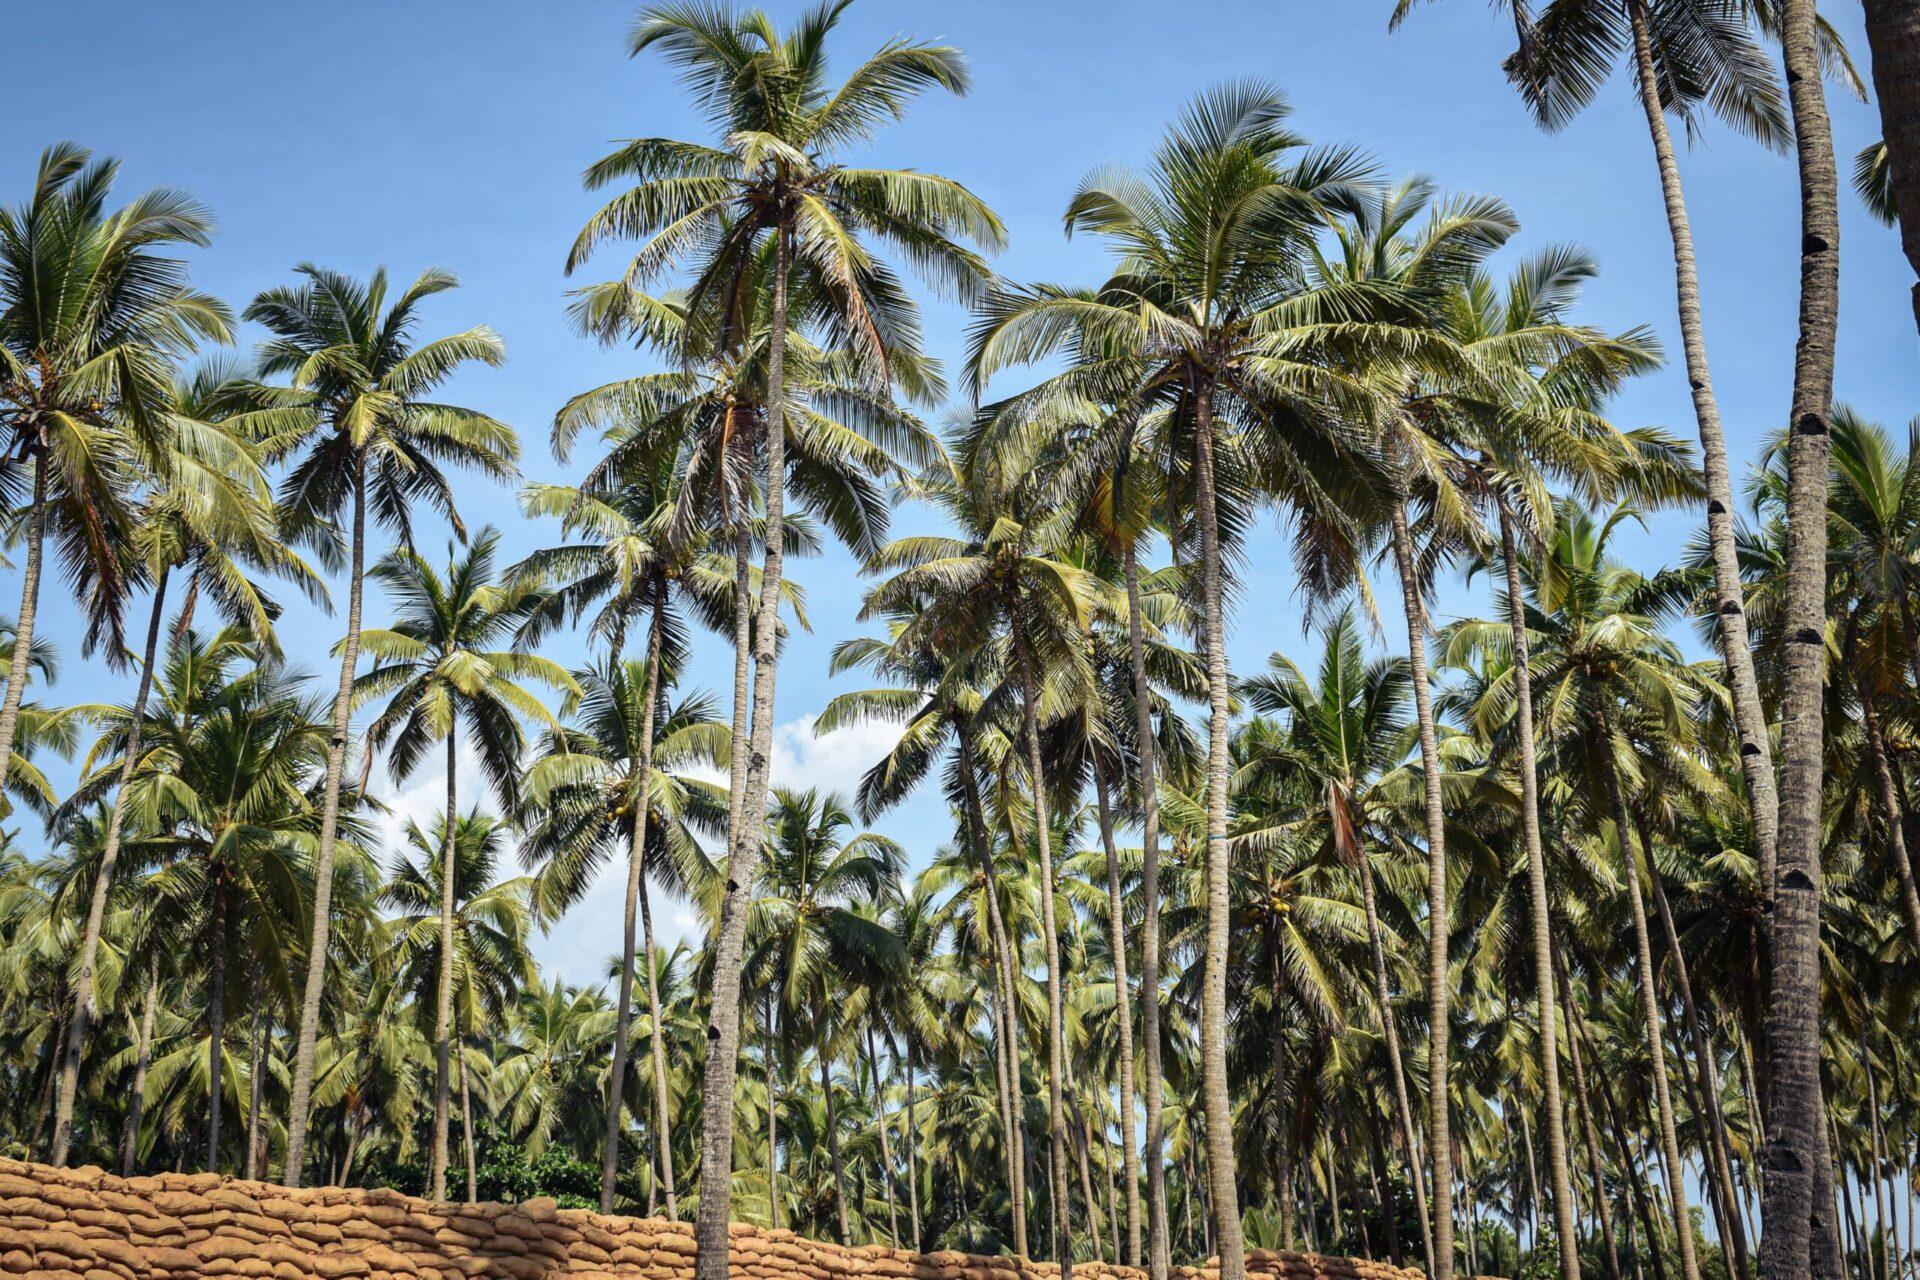 Big Coconut Trees on the Goa Beach Side